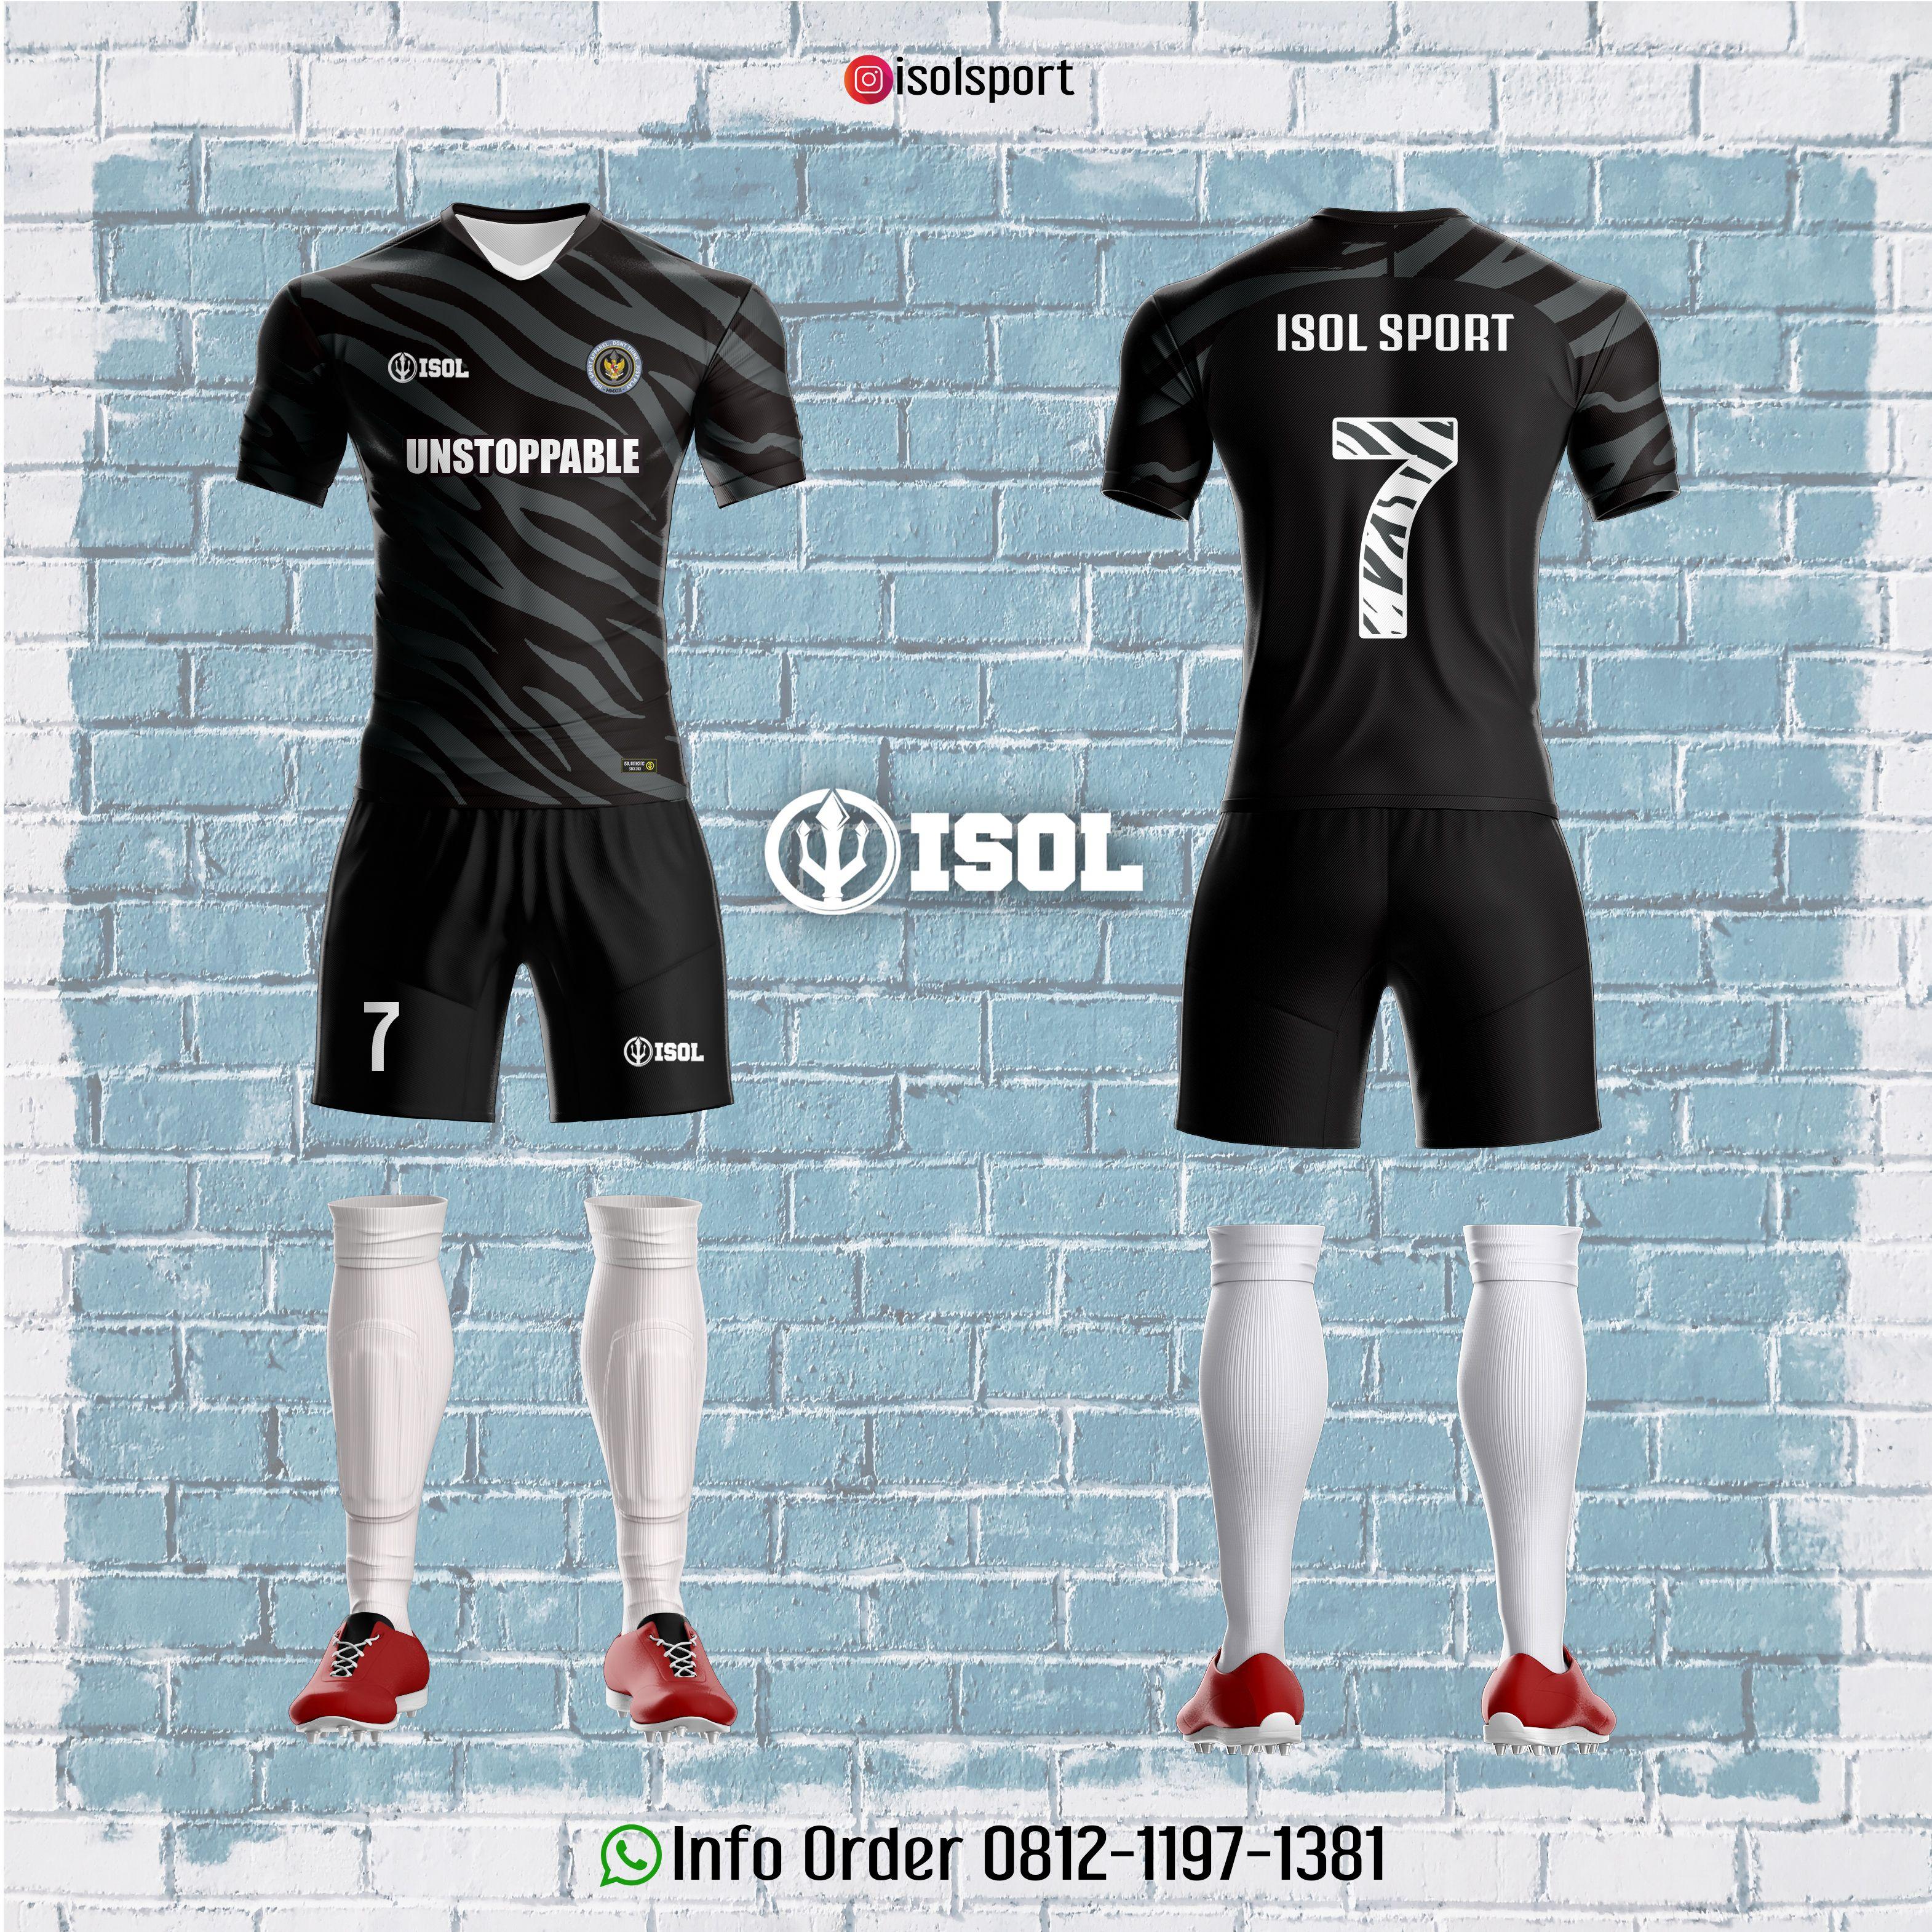 Desain Baju Futsal Printing Custom Isolsport Bikins Fashion Swimwear